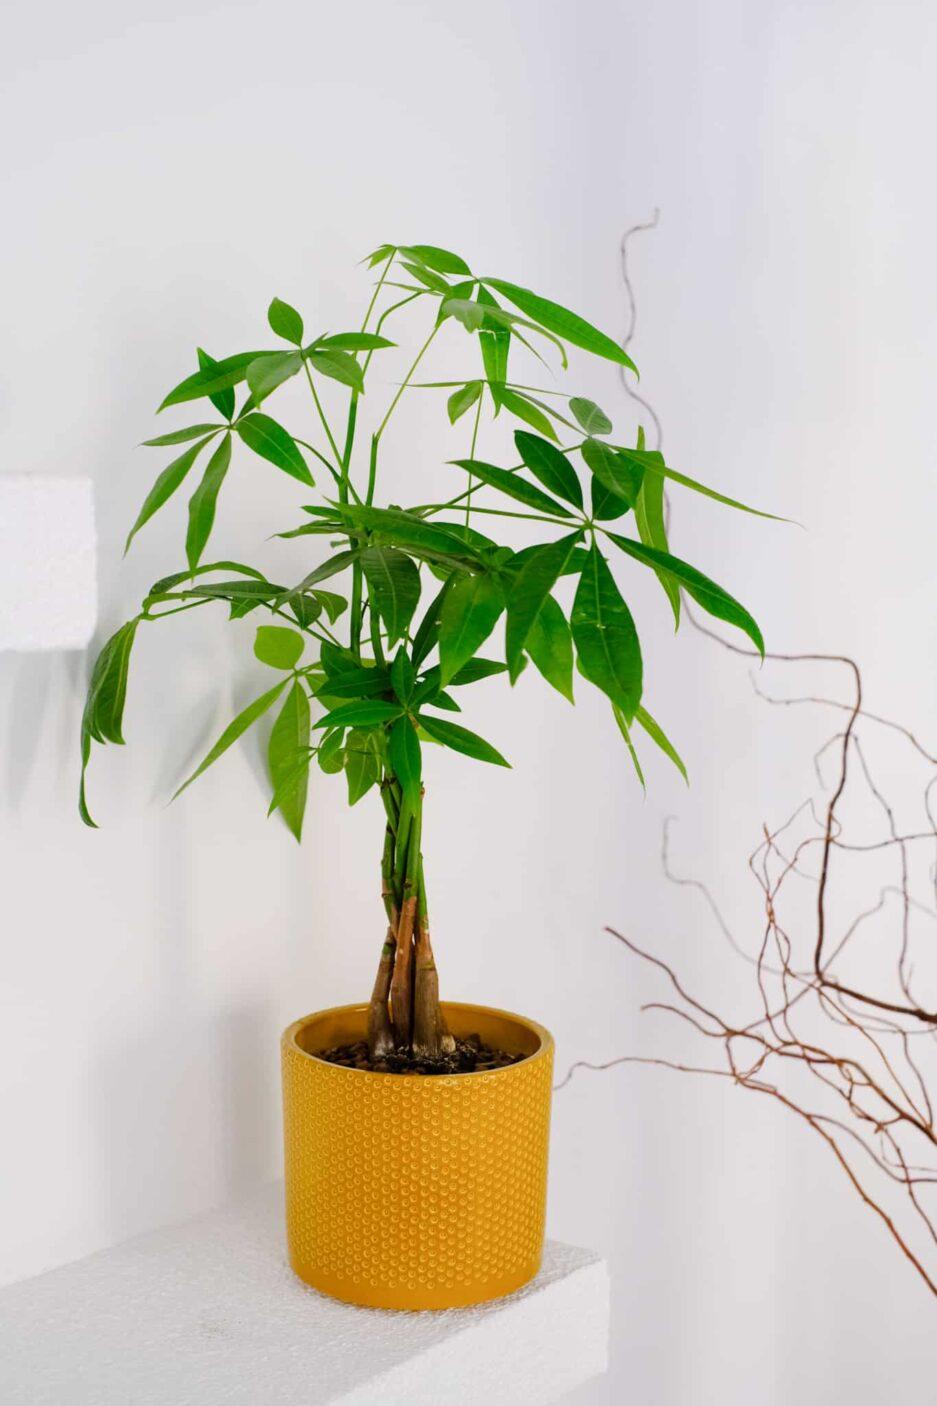 Pachira Aquatica (Para Ağacı) Bal-Sarı Saksılı